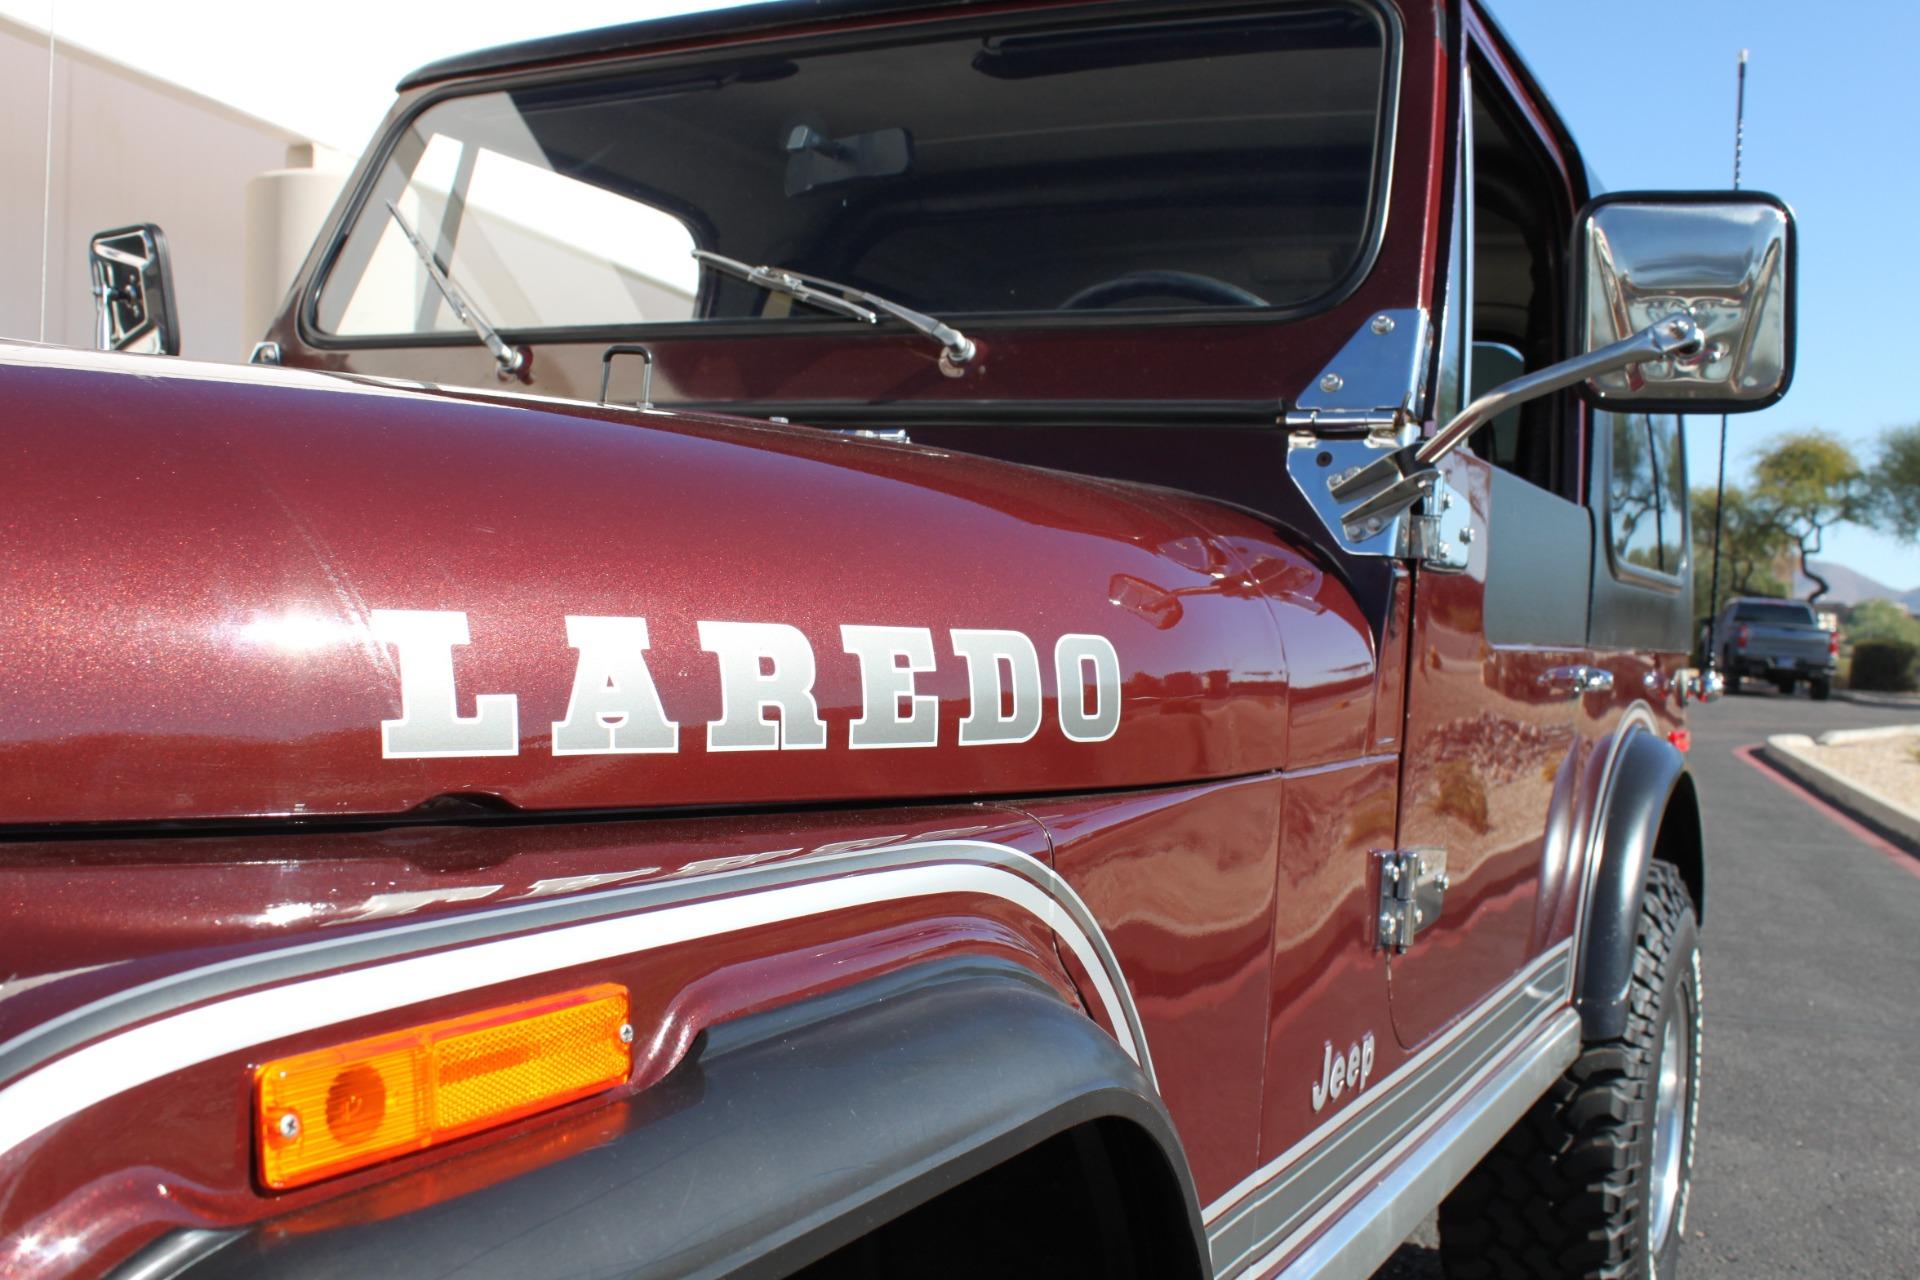 Used-1980-Jeep-CJ7-4WD-Alfa-Romeo